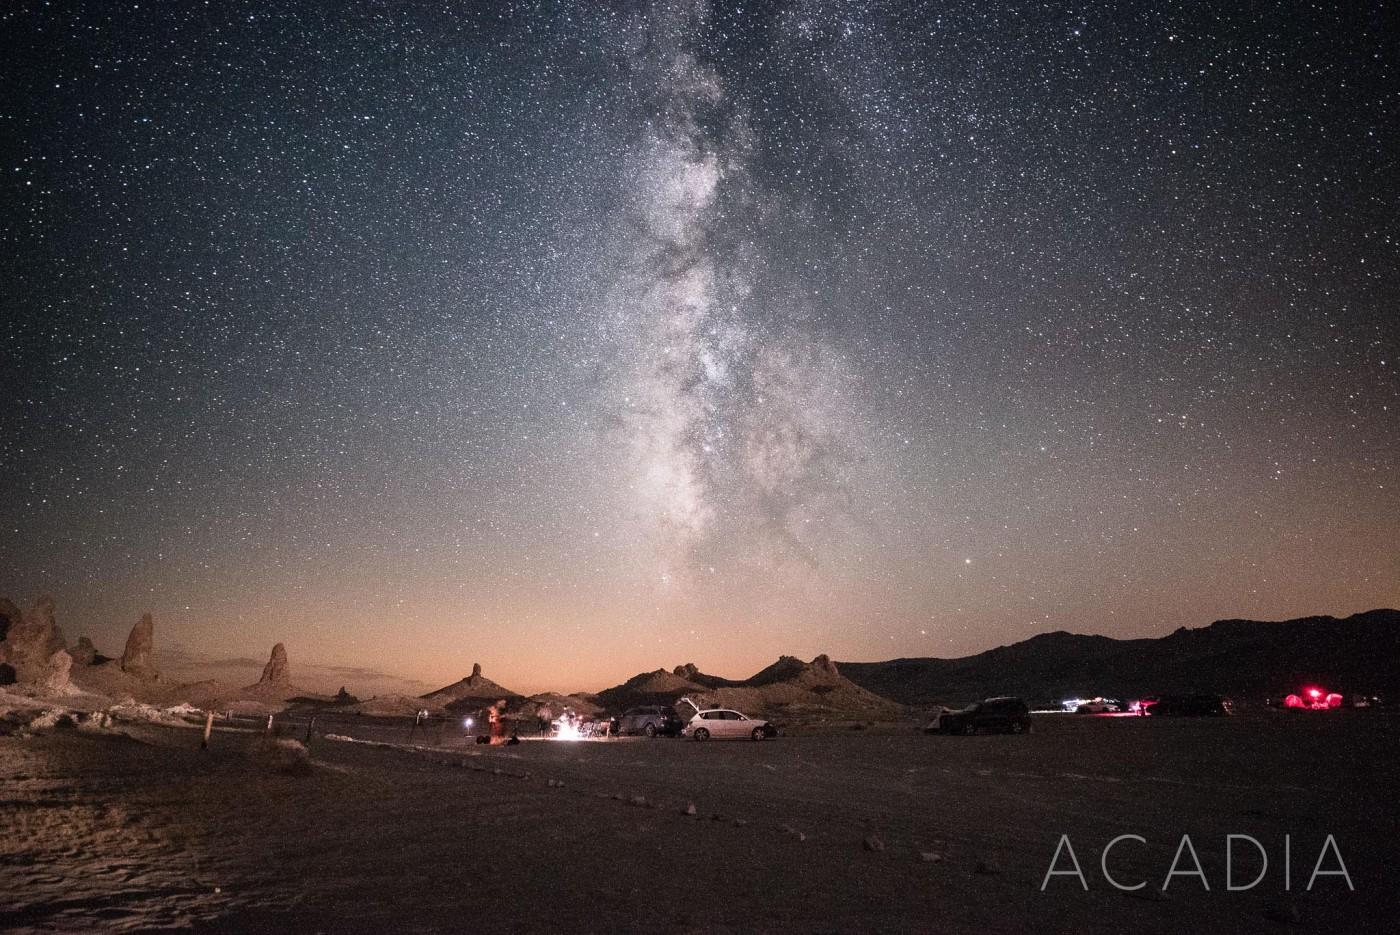 acadia-milky-way-astrophotography-lonely-speck-lightroom-preset-1